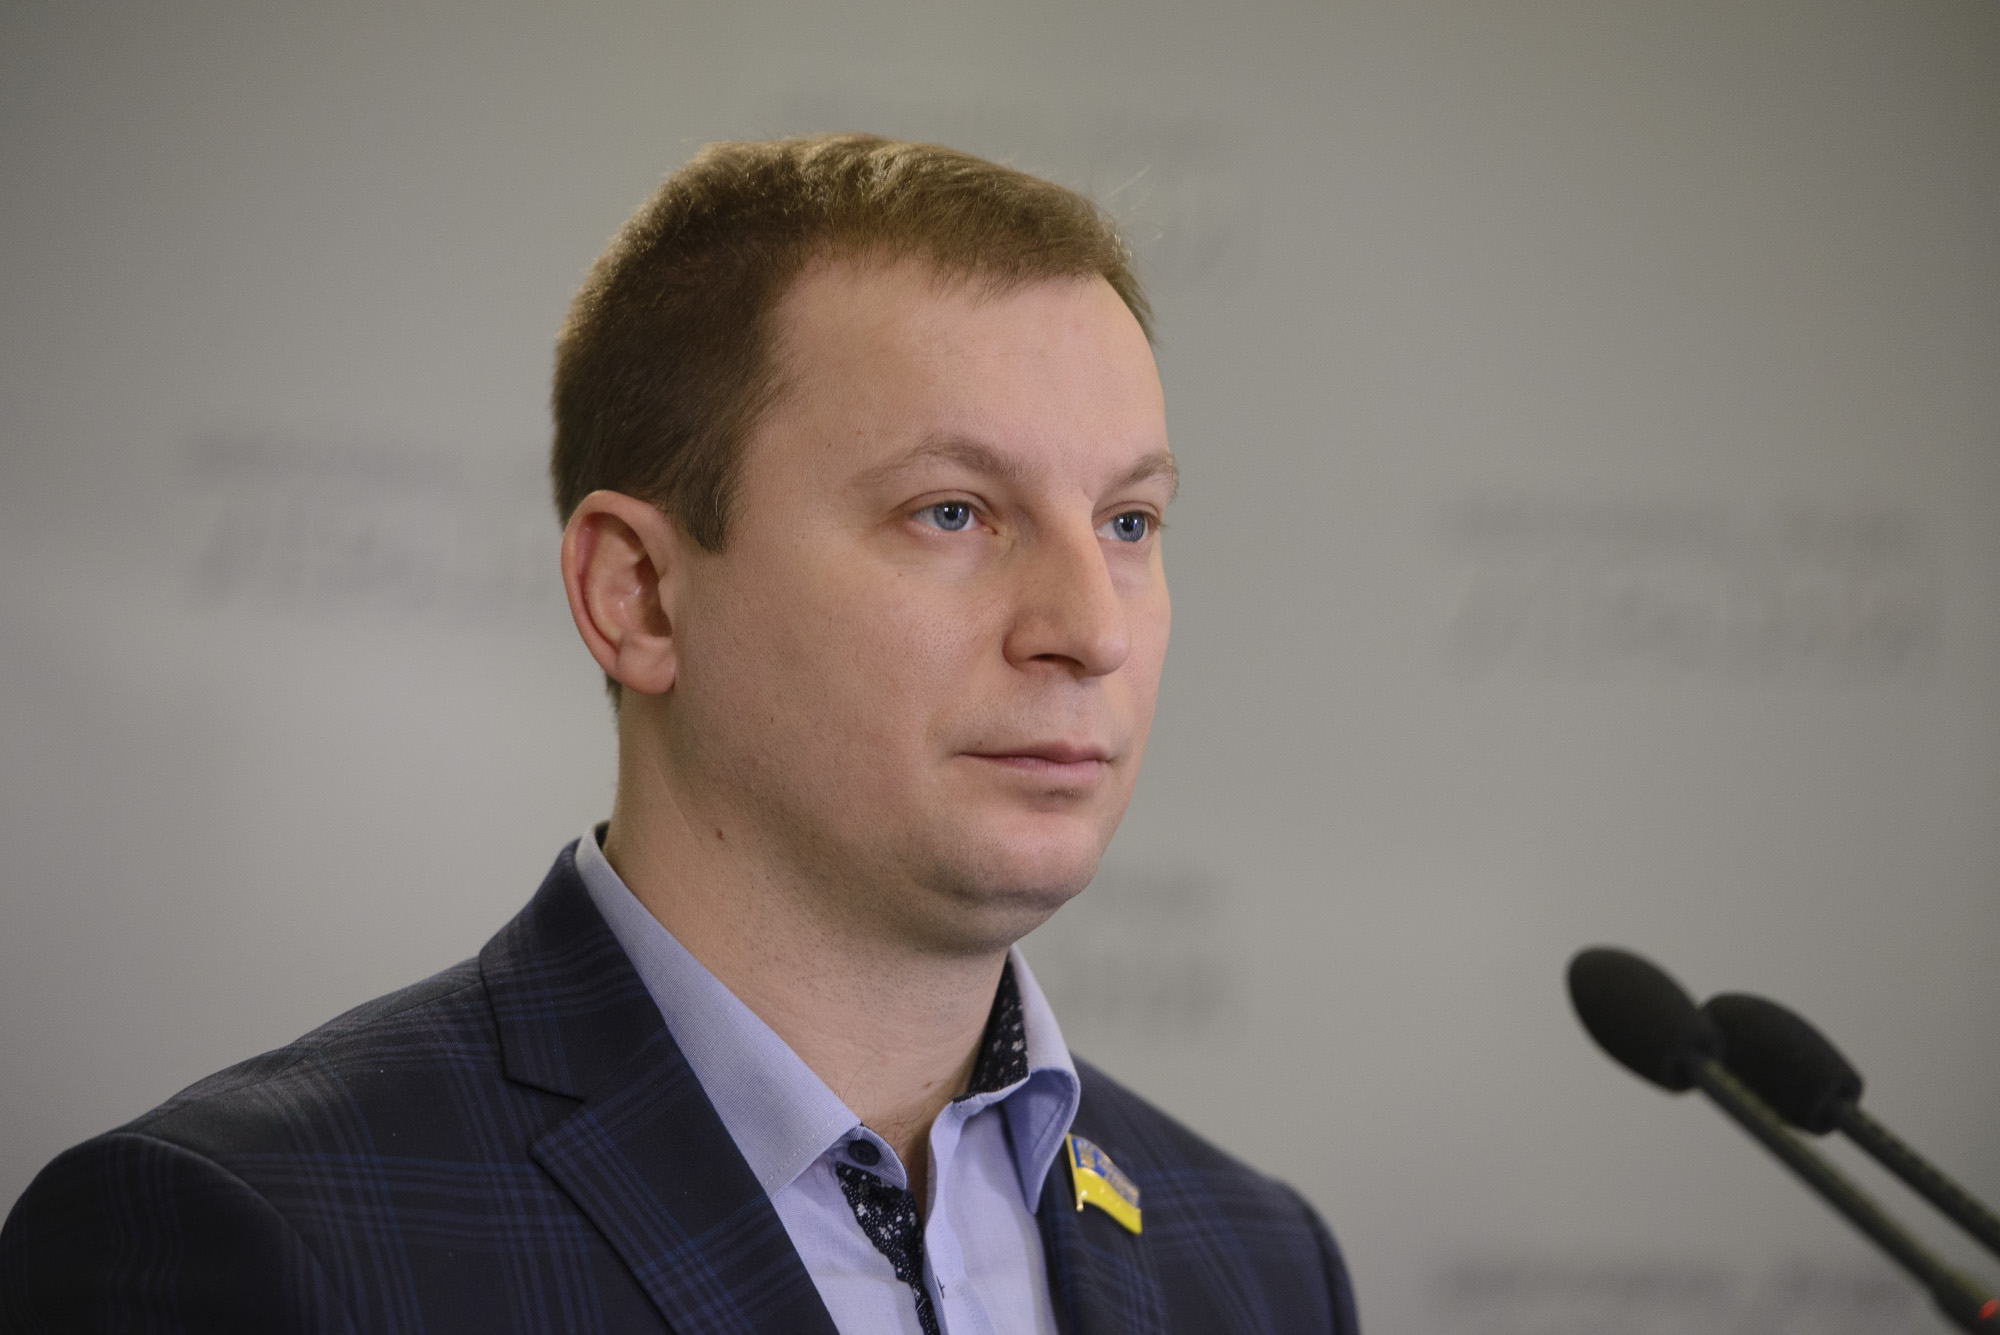 Голова Тернопільської ОДА Степан Барна пишається тим, що його область стала №22 в рейтингу областей